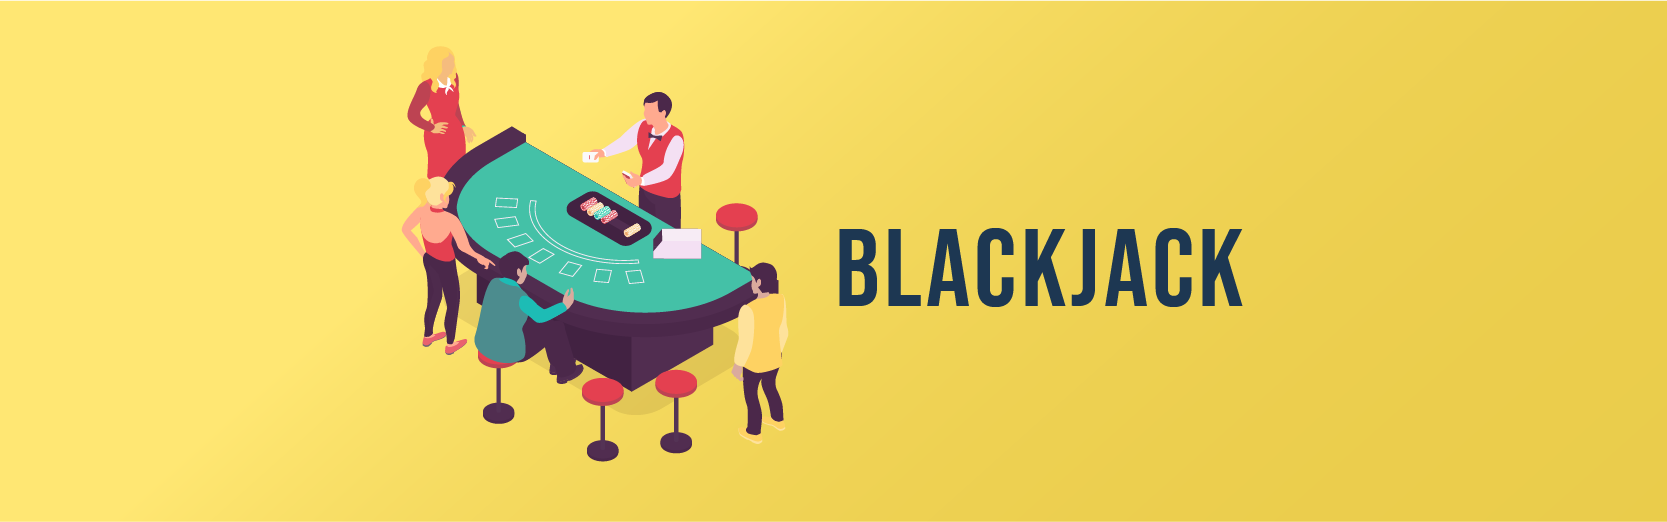 blackjack banner